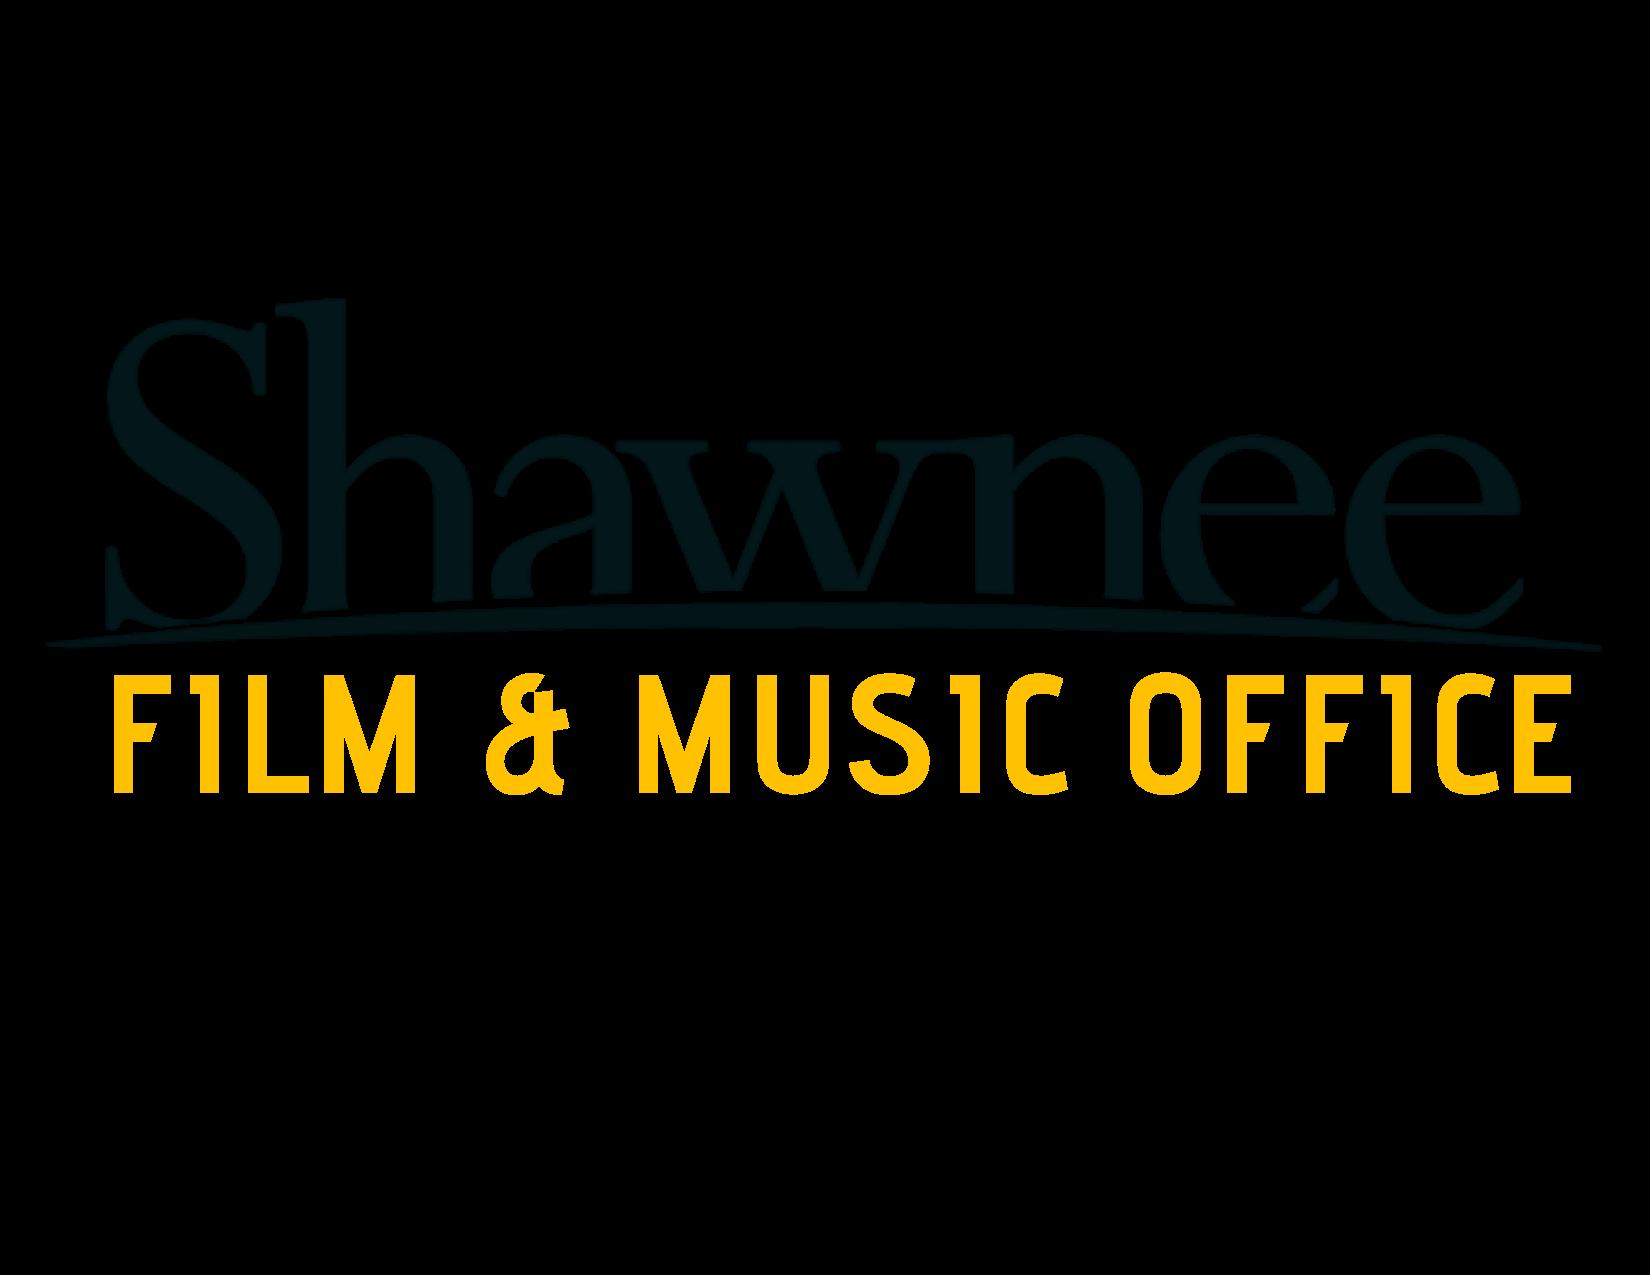 Shawnee Film and Music Office